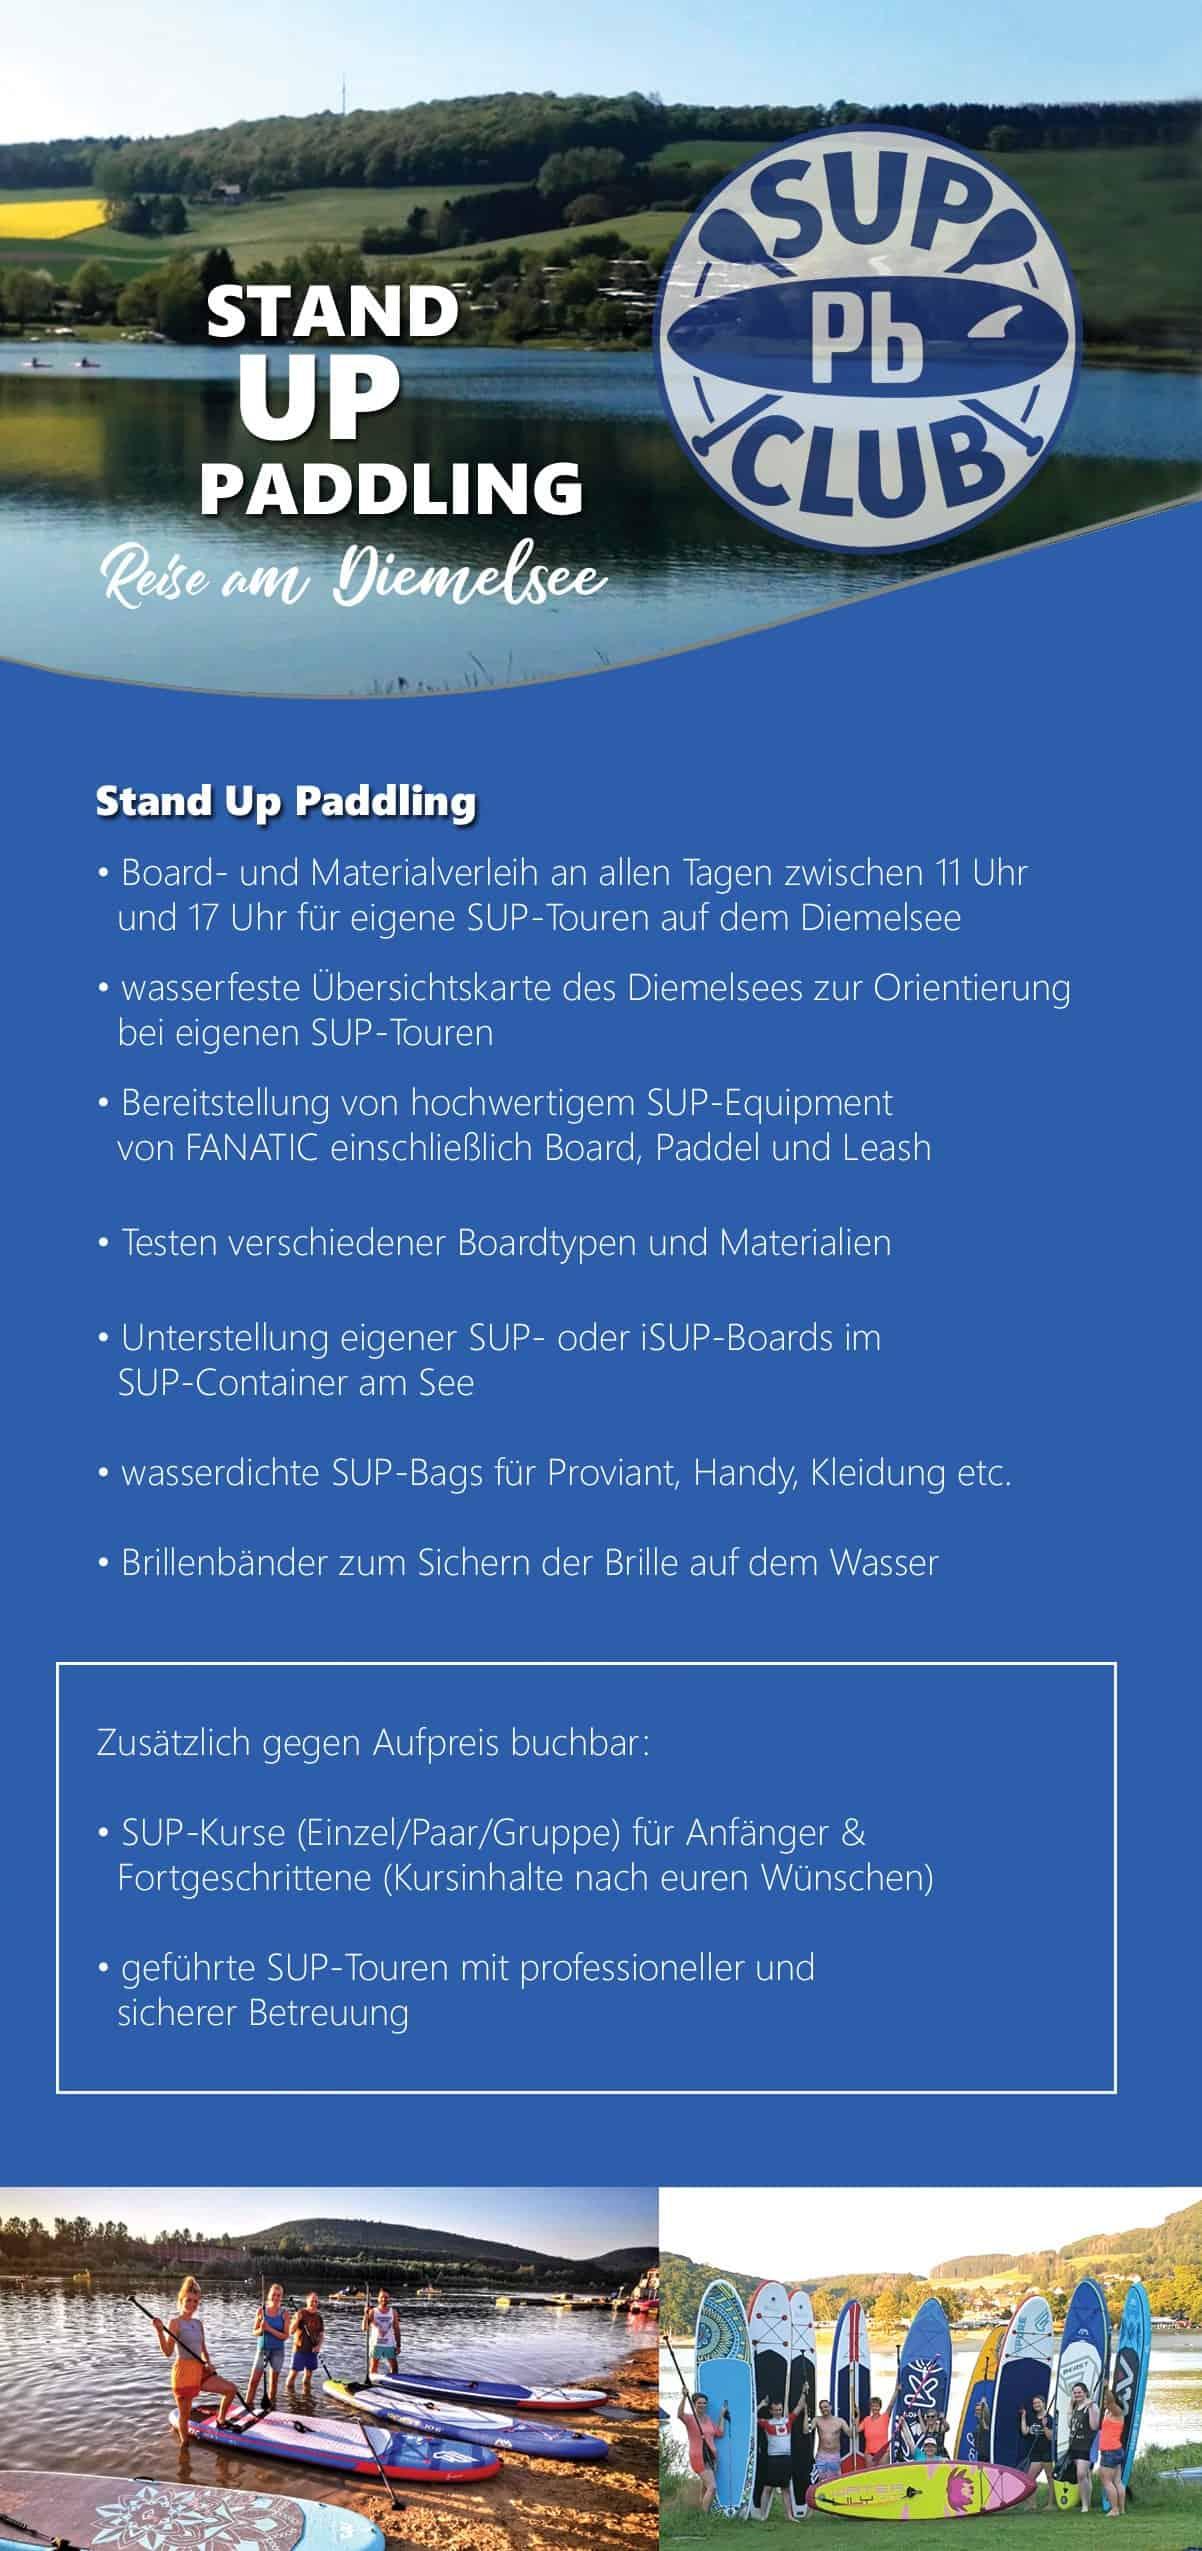 HolidayHOUSE Marta - Stand Up Paddling Diemelsee